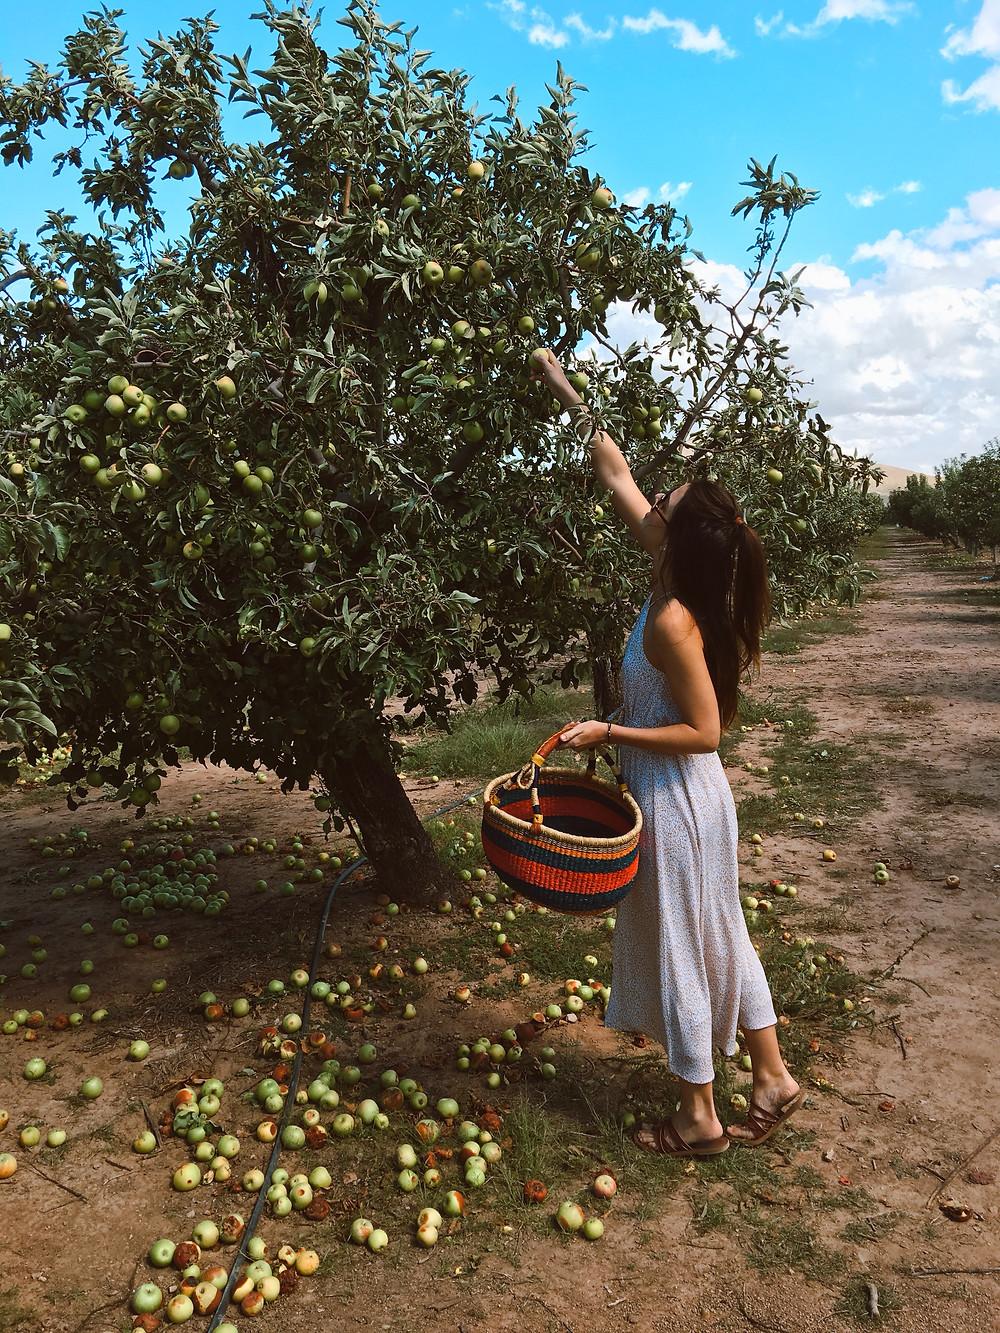 Apple picking in Willcox, AZ